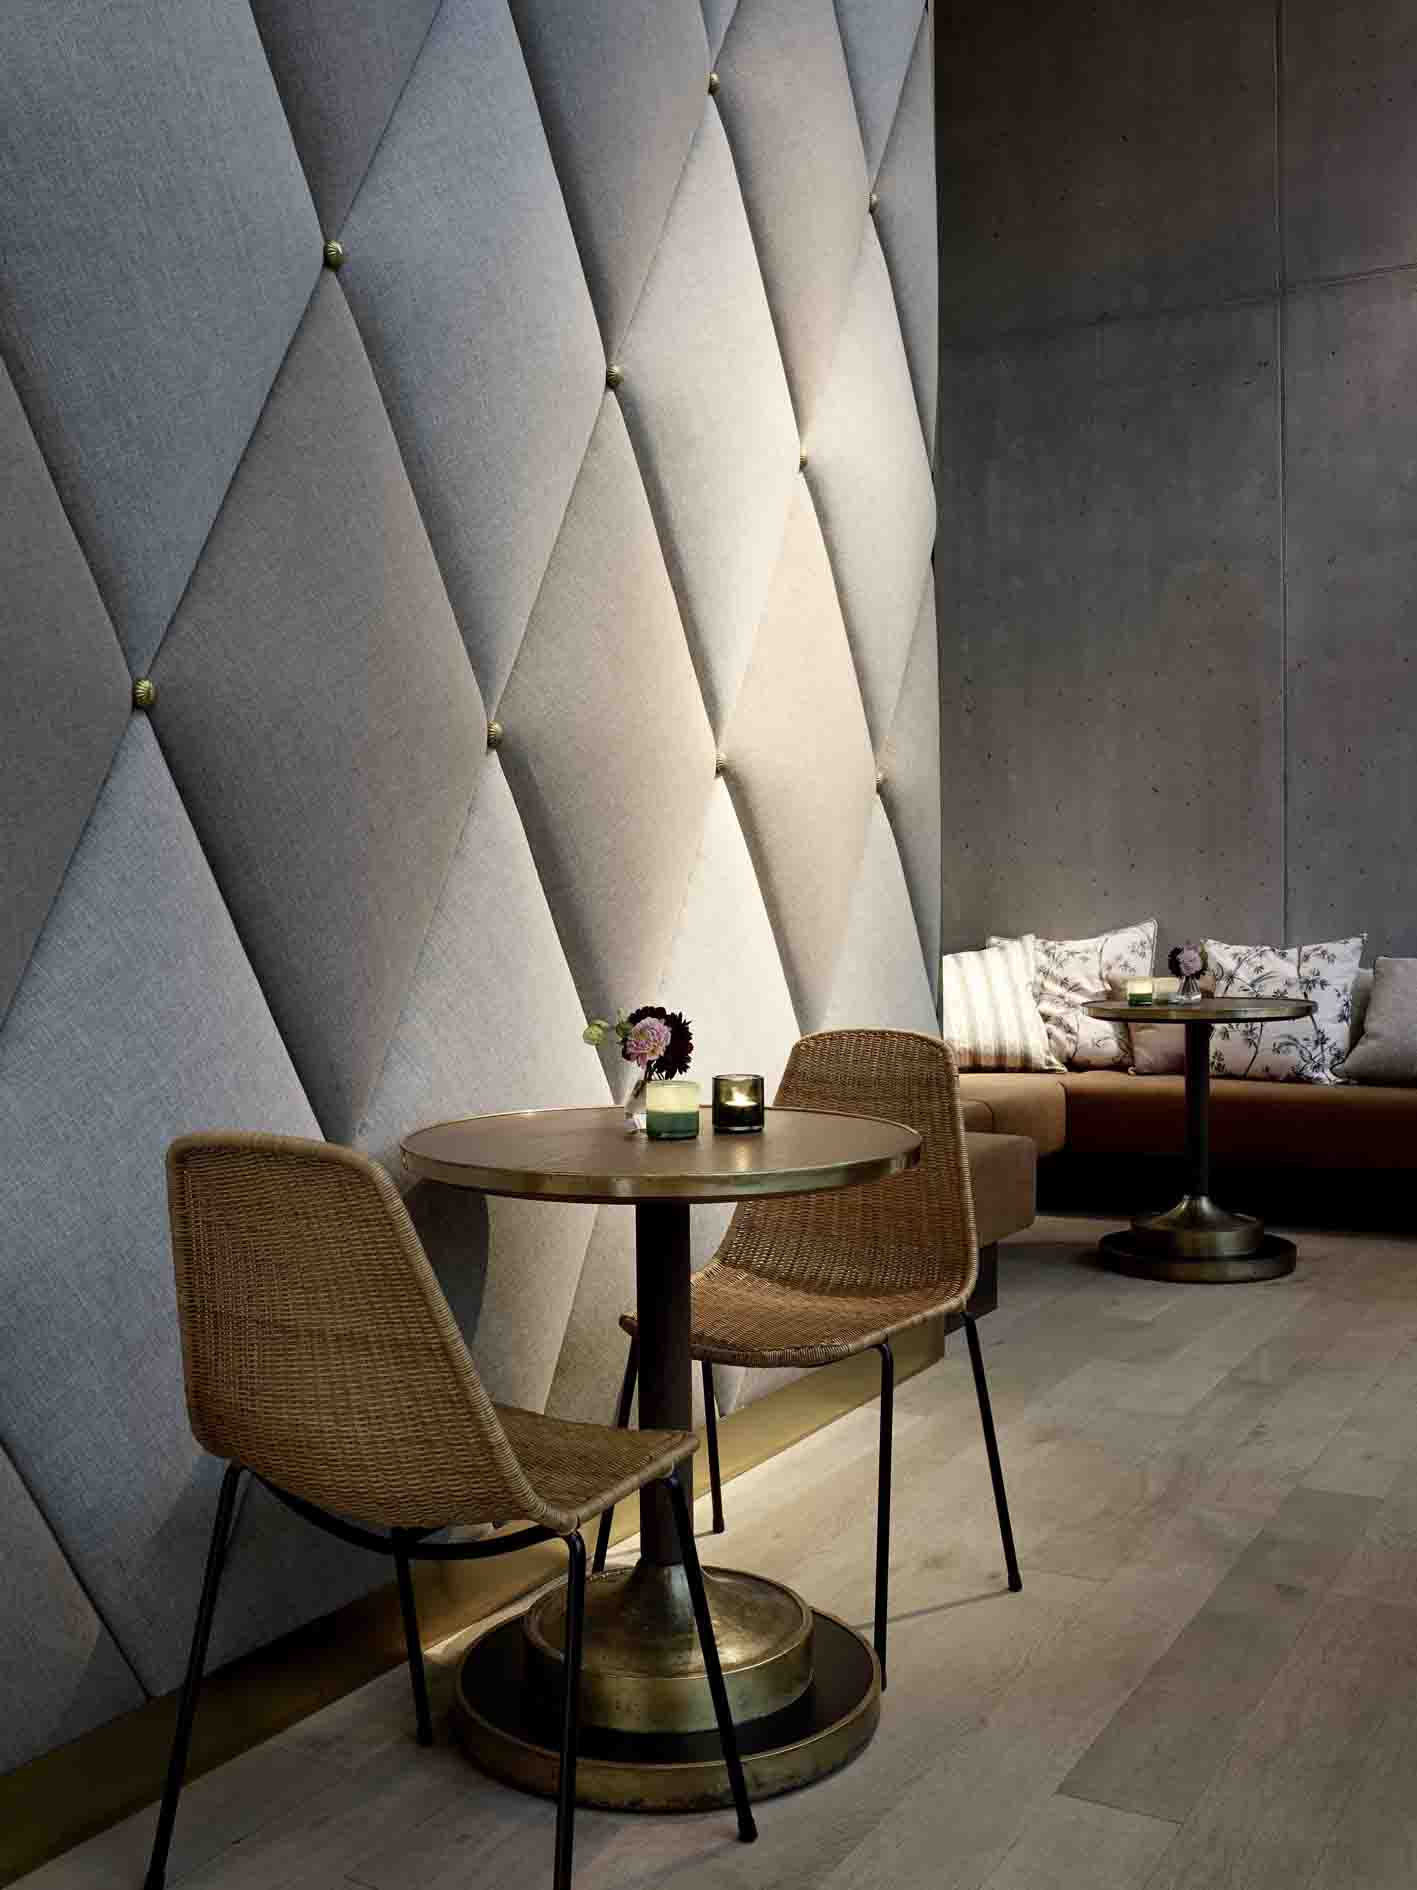 Beleuchtung im Restaurant Bebek, Kaffeehaus Atmosphäre